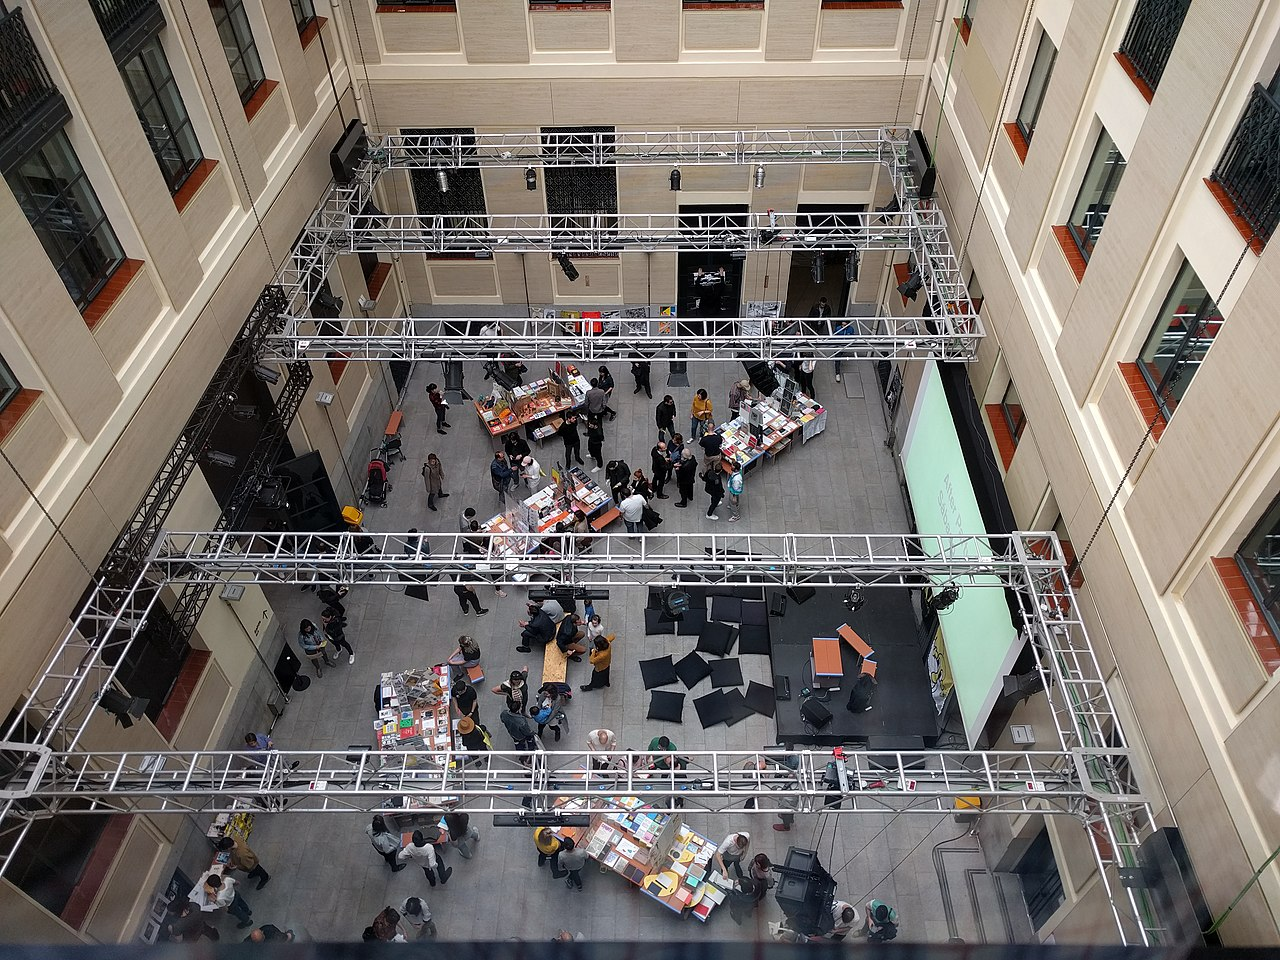 File Casa Encendida Patio Interior Madrid 2018 01 Jpg